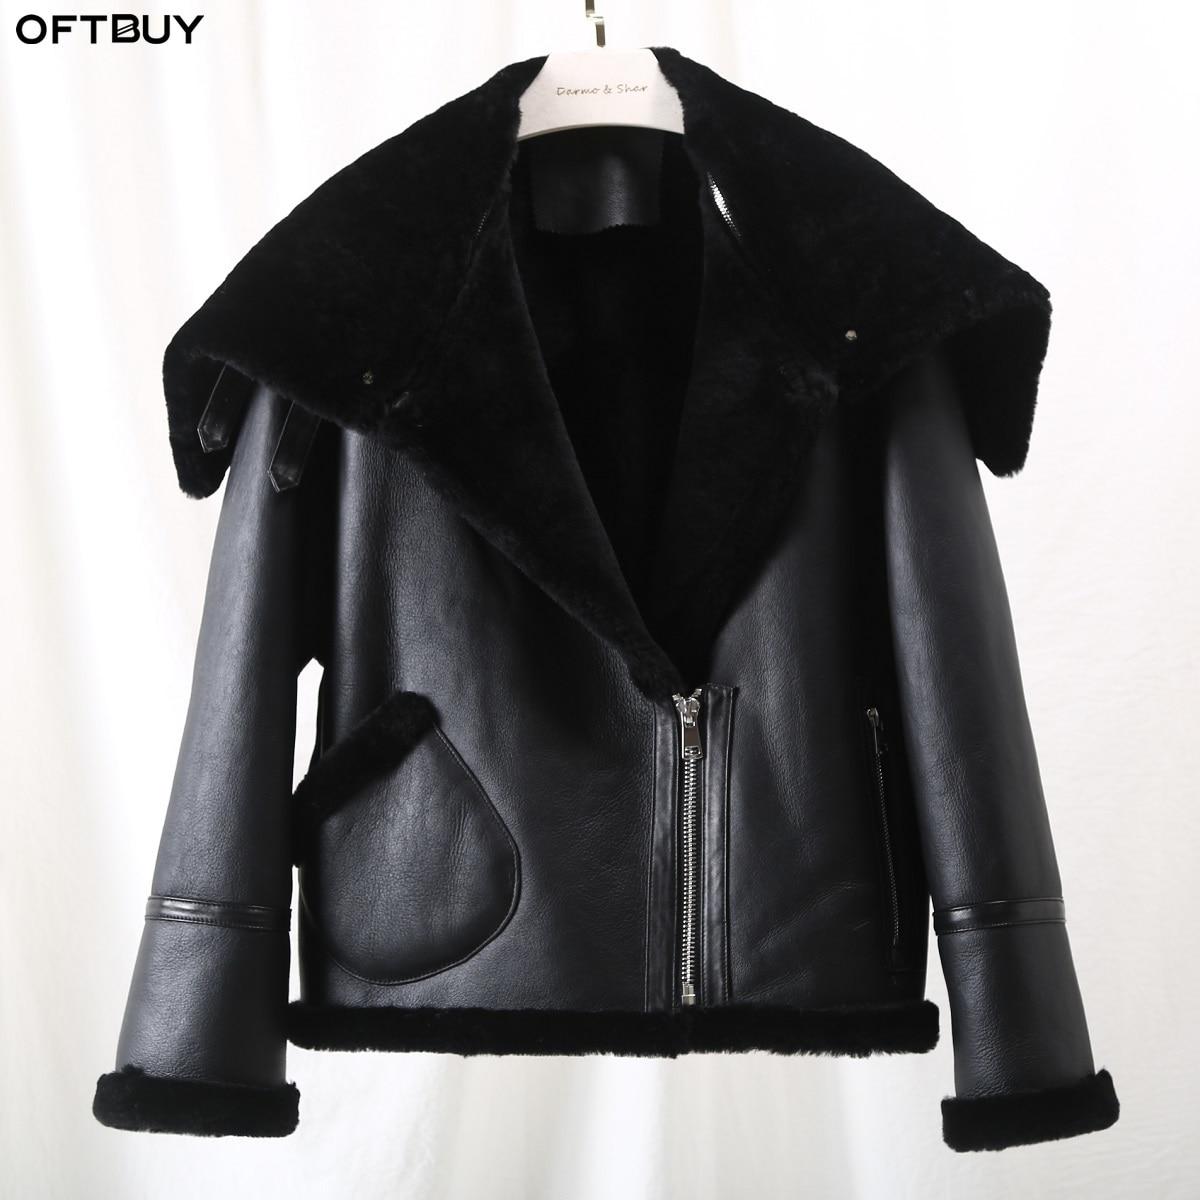 OFTBUY 2019 Winter Jacket Women Double-faced Fur Coat Parka Real Lamb Fur Genuine Leather Thick Warm Streetwear Outwear Casual